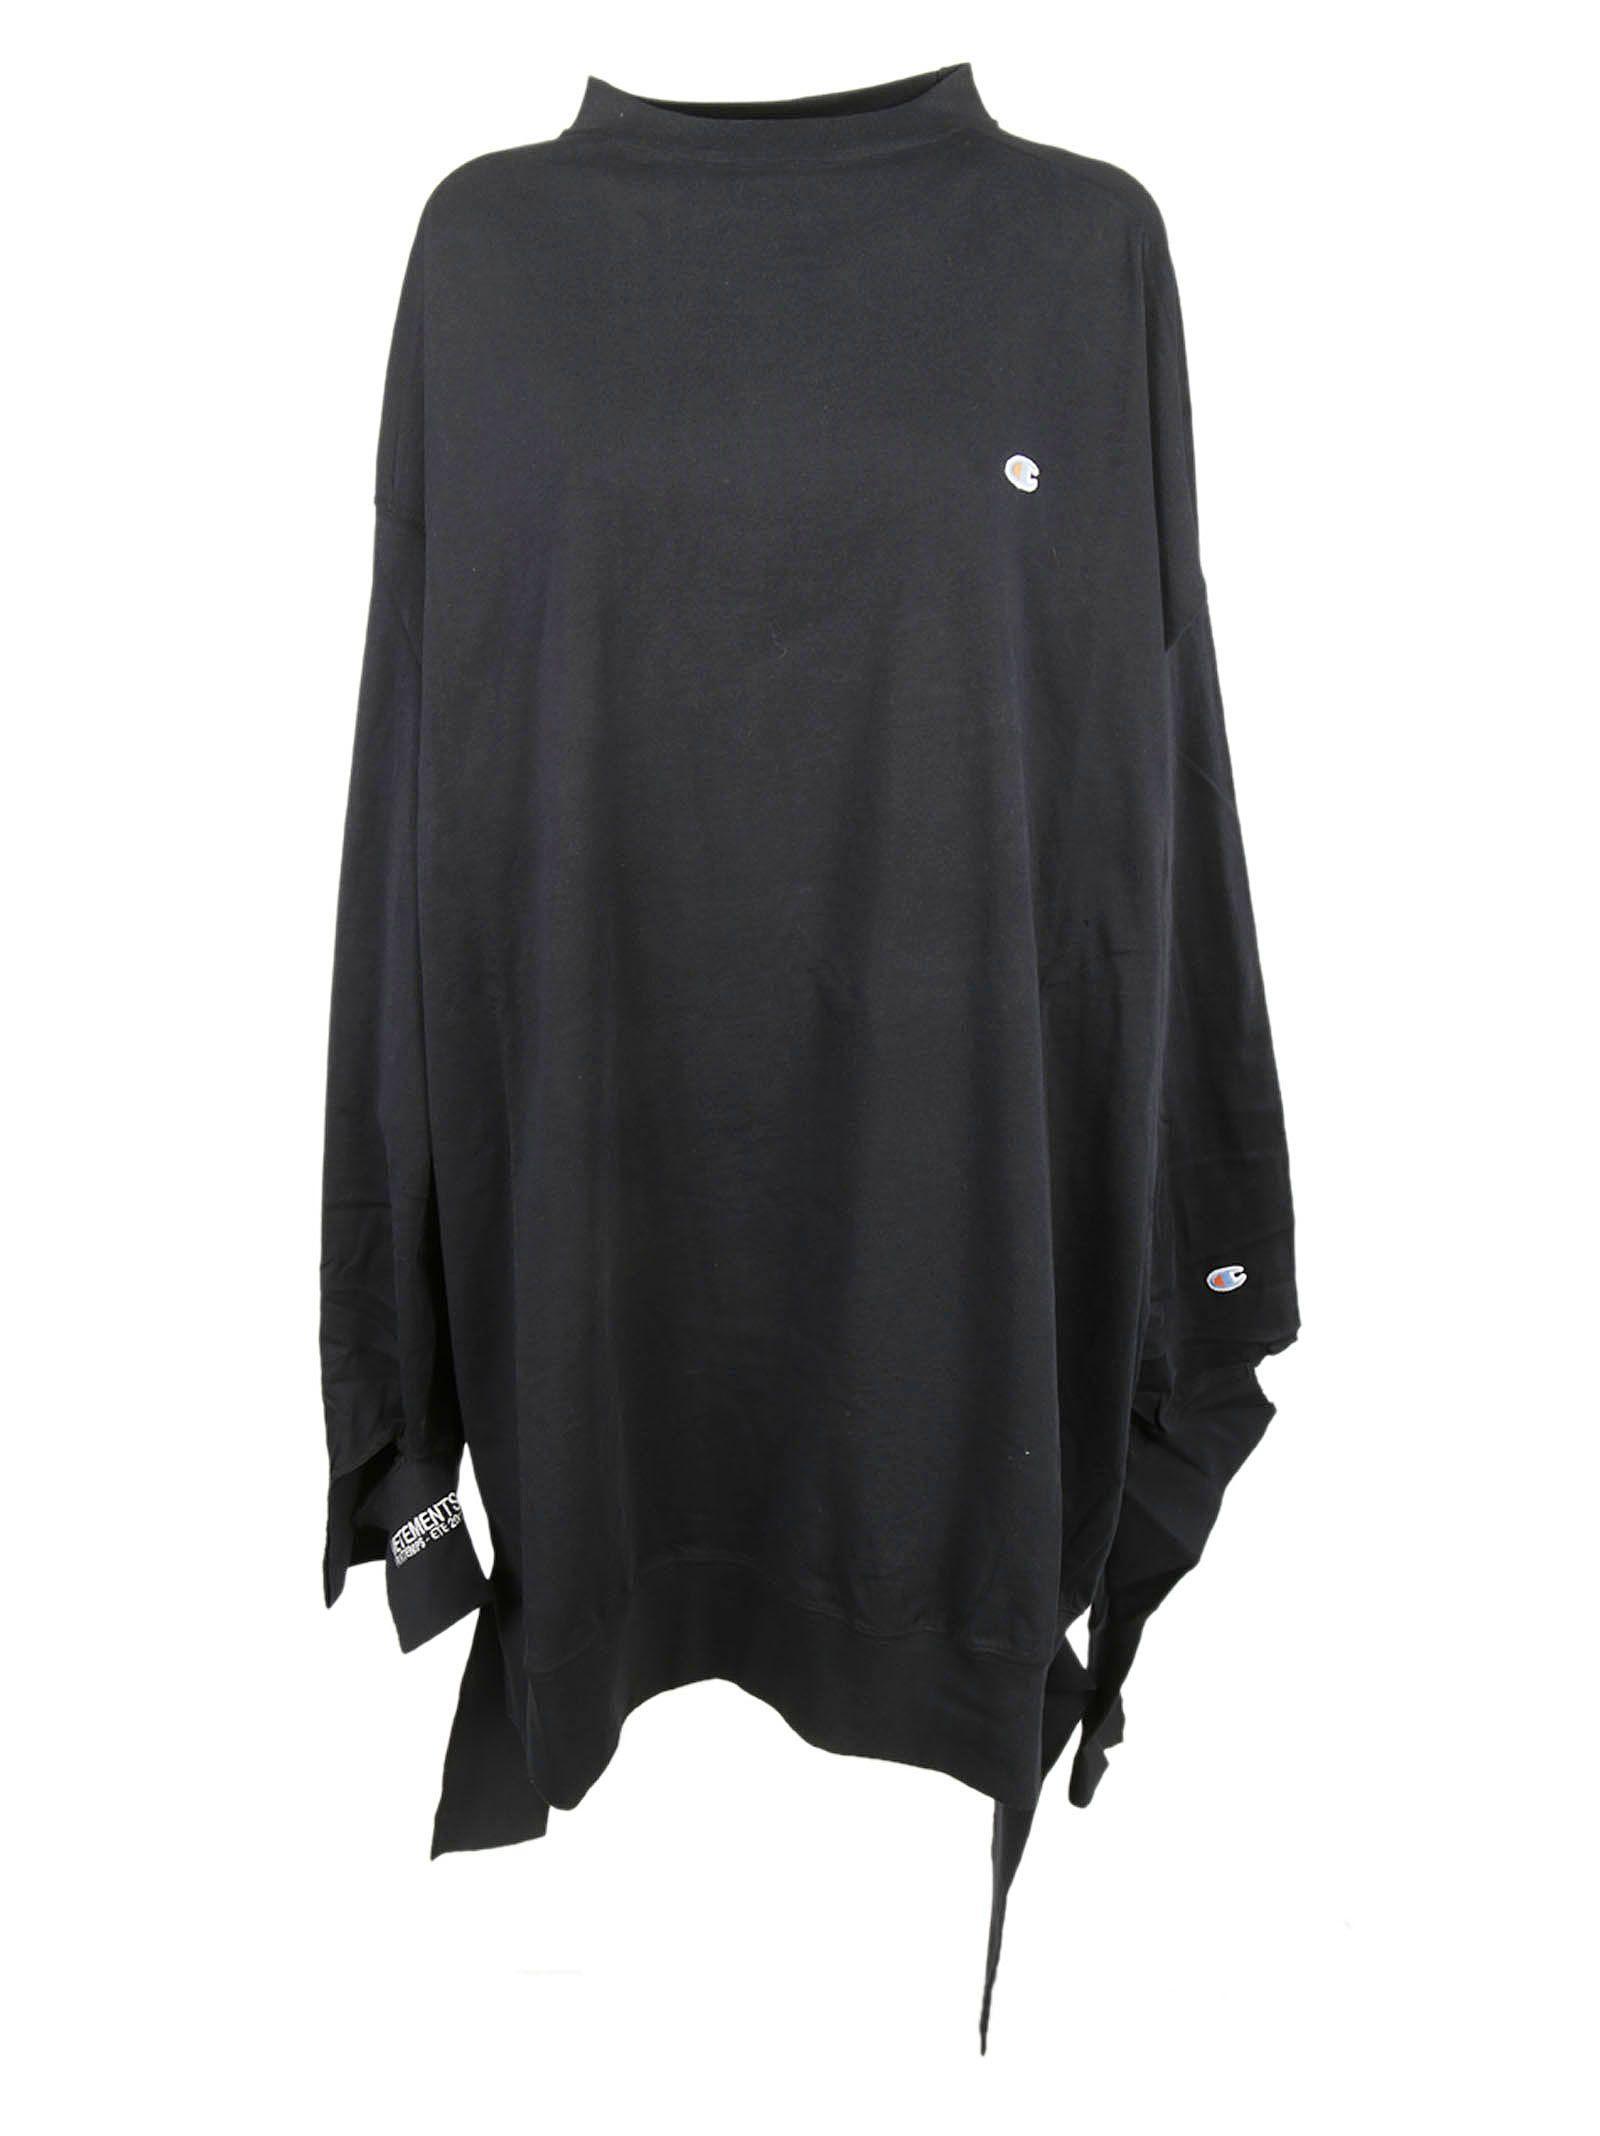 Vetements Champion Oversized Jersey Dress